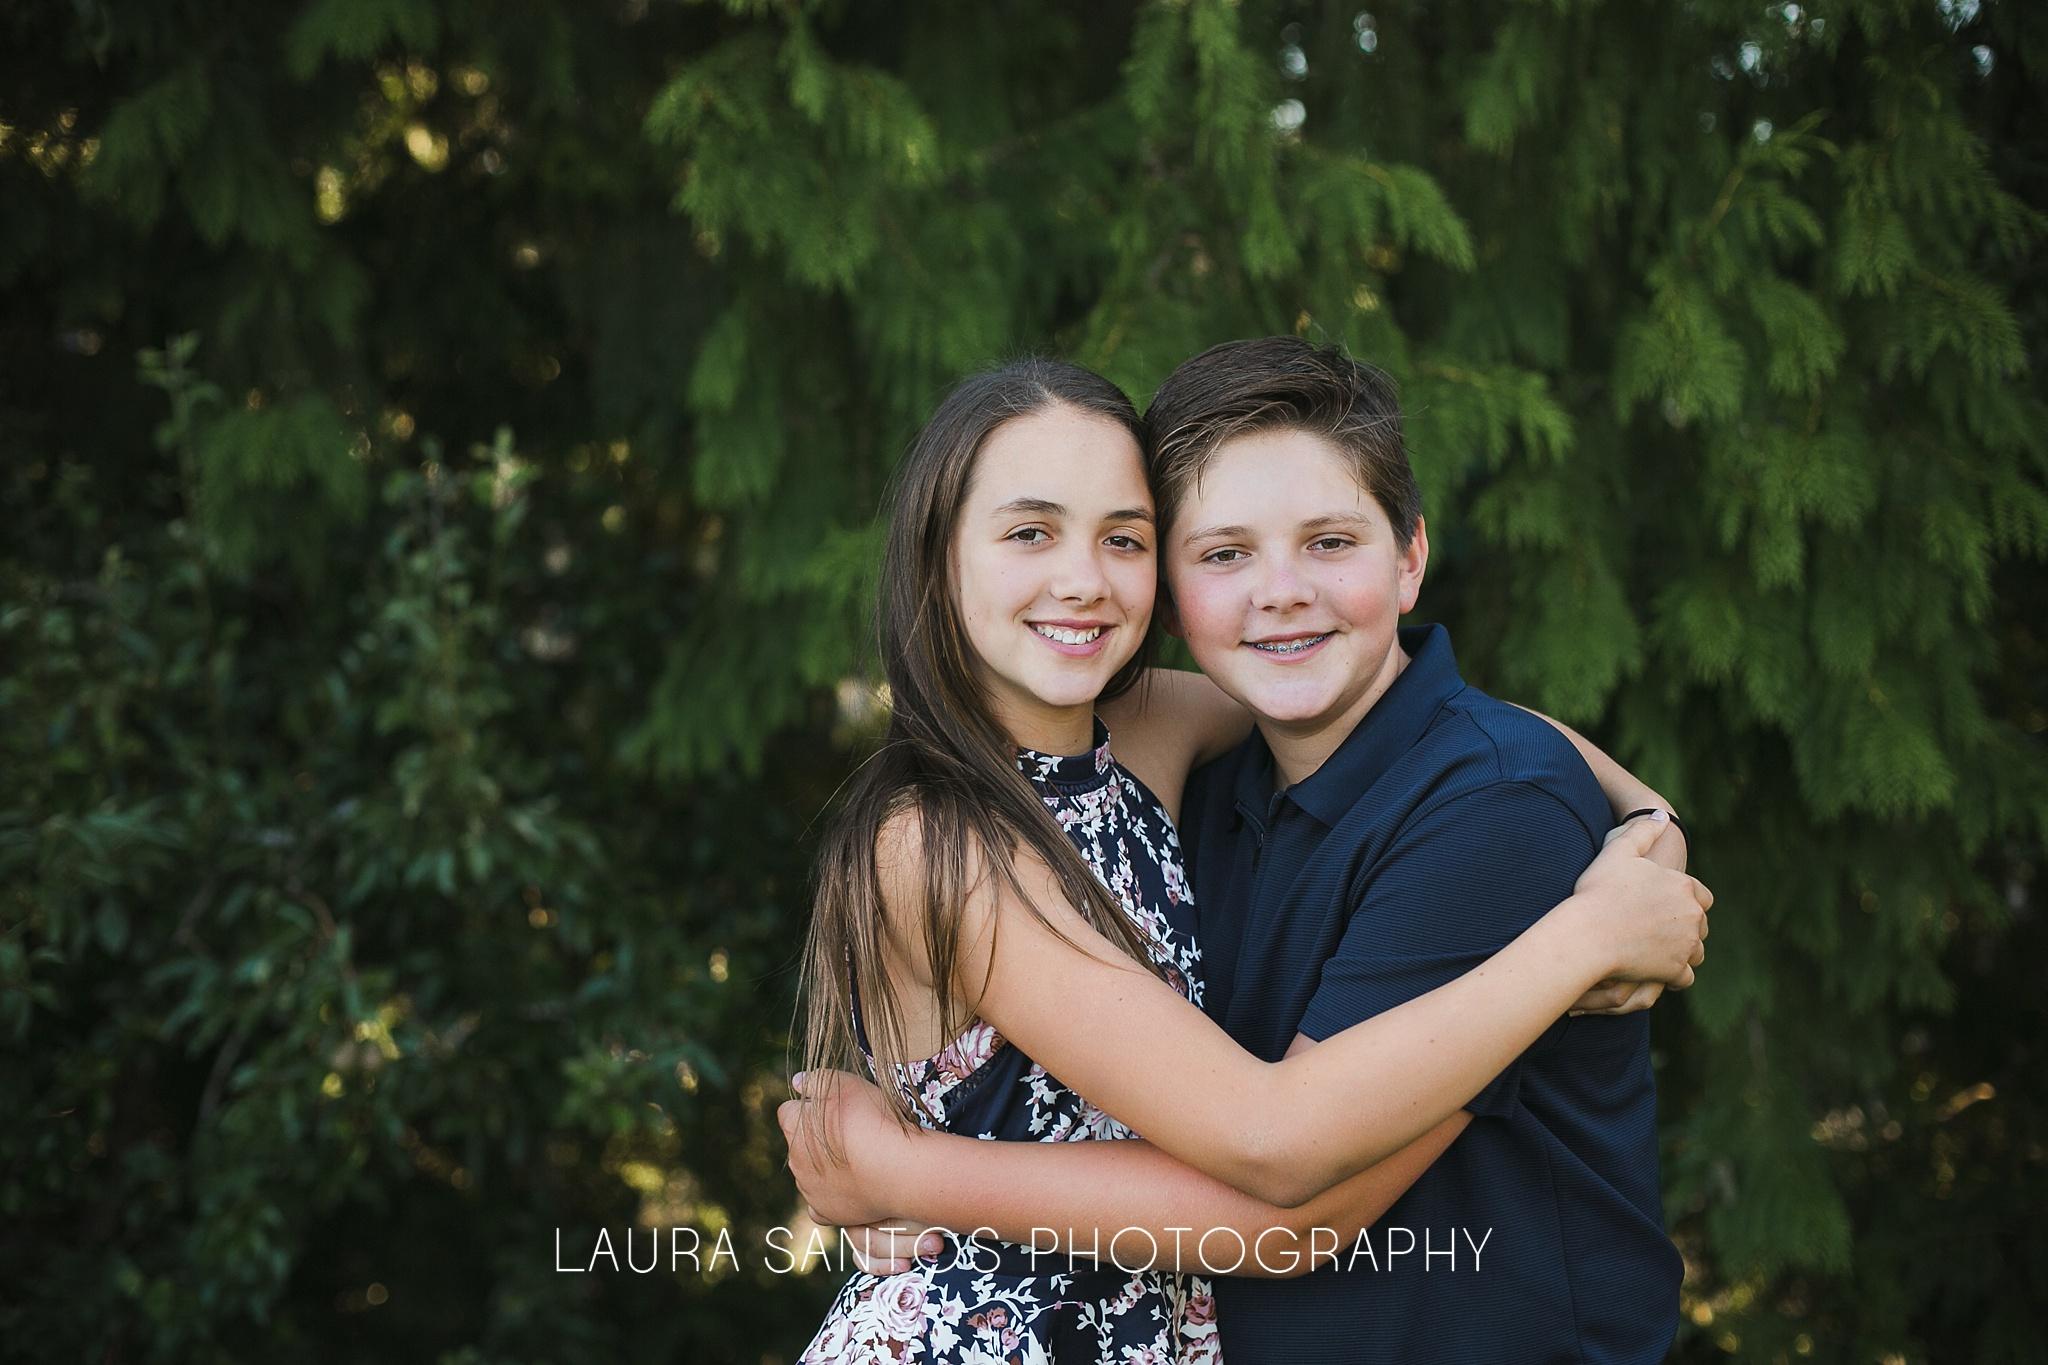 Laura Santos Photography Portland Oregon Family Photographer_0121.jpg